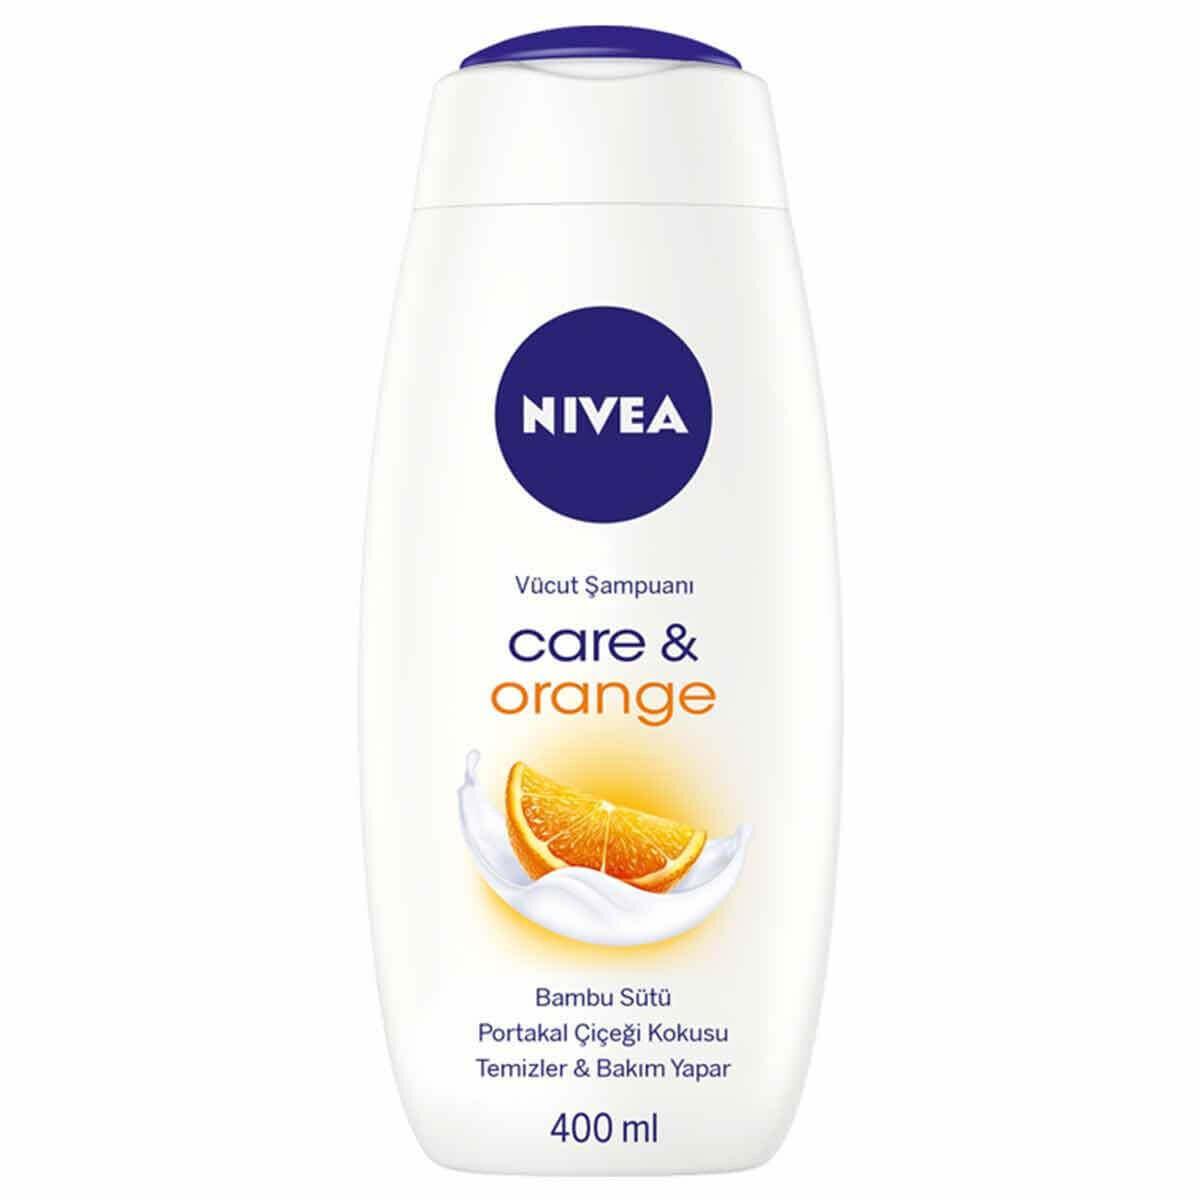 Care & Orange Vücut Şampuanı 400 ml